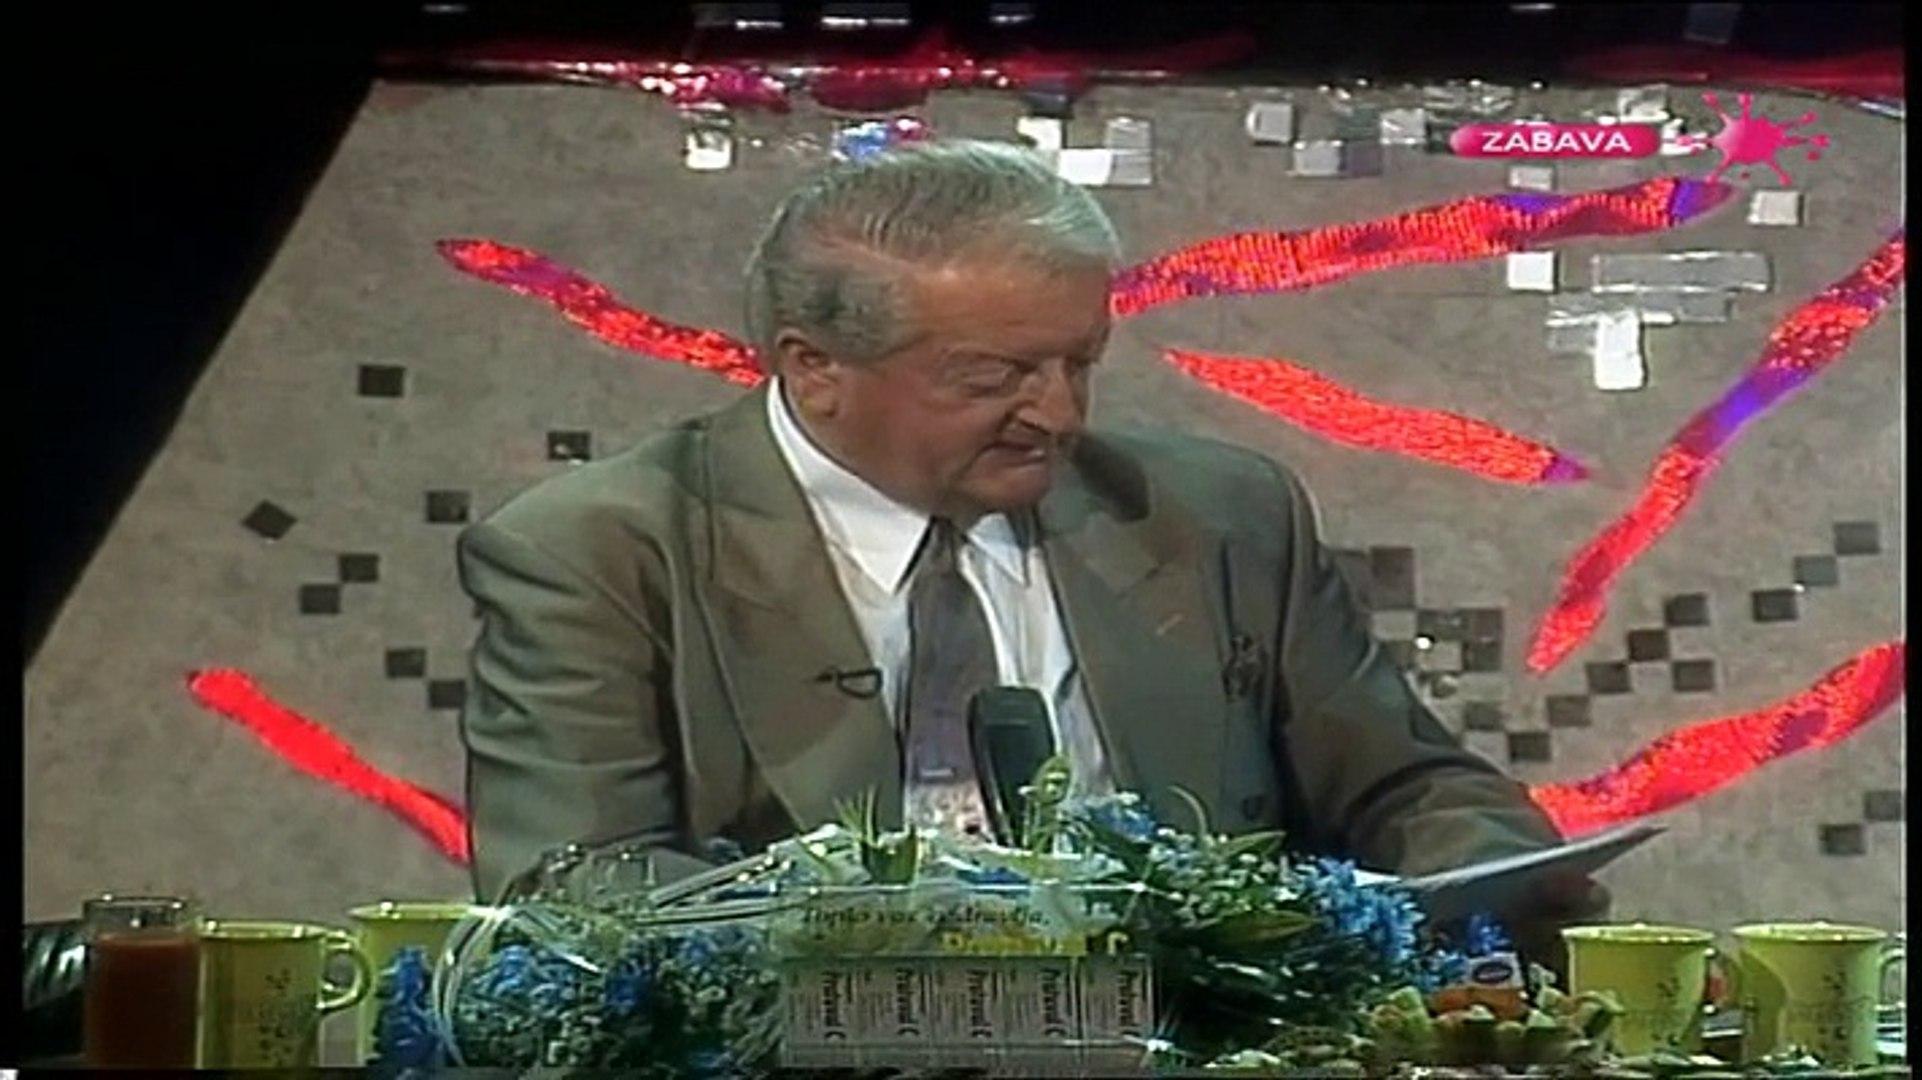 Maksovizija - Arkan, Ivana Zigon i Milic Vukasinovic 1999 (deo 1-2)